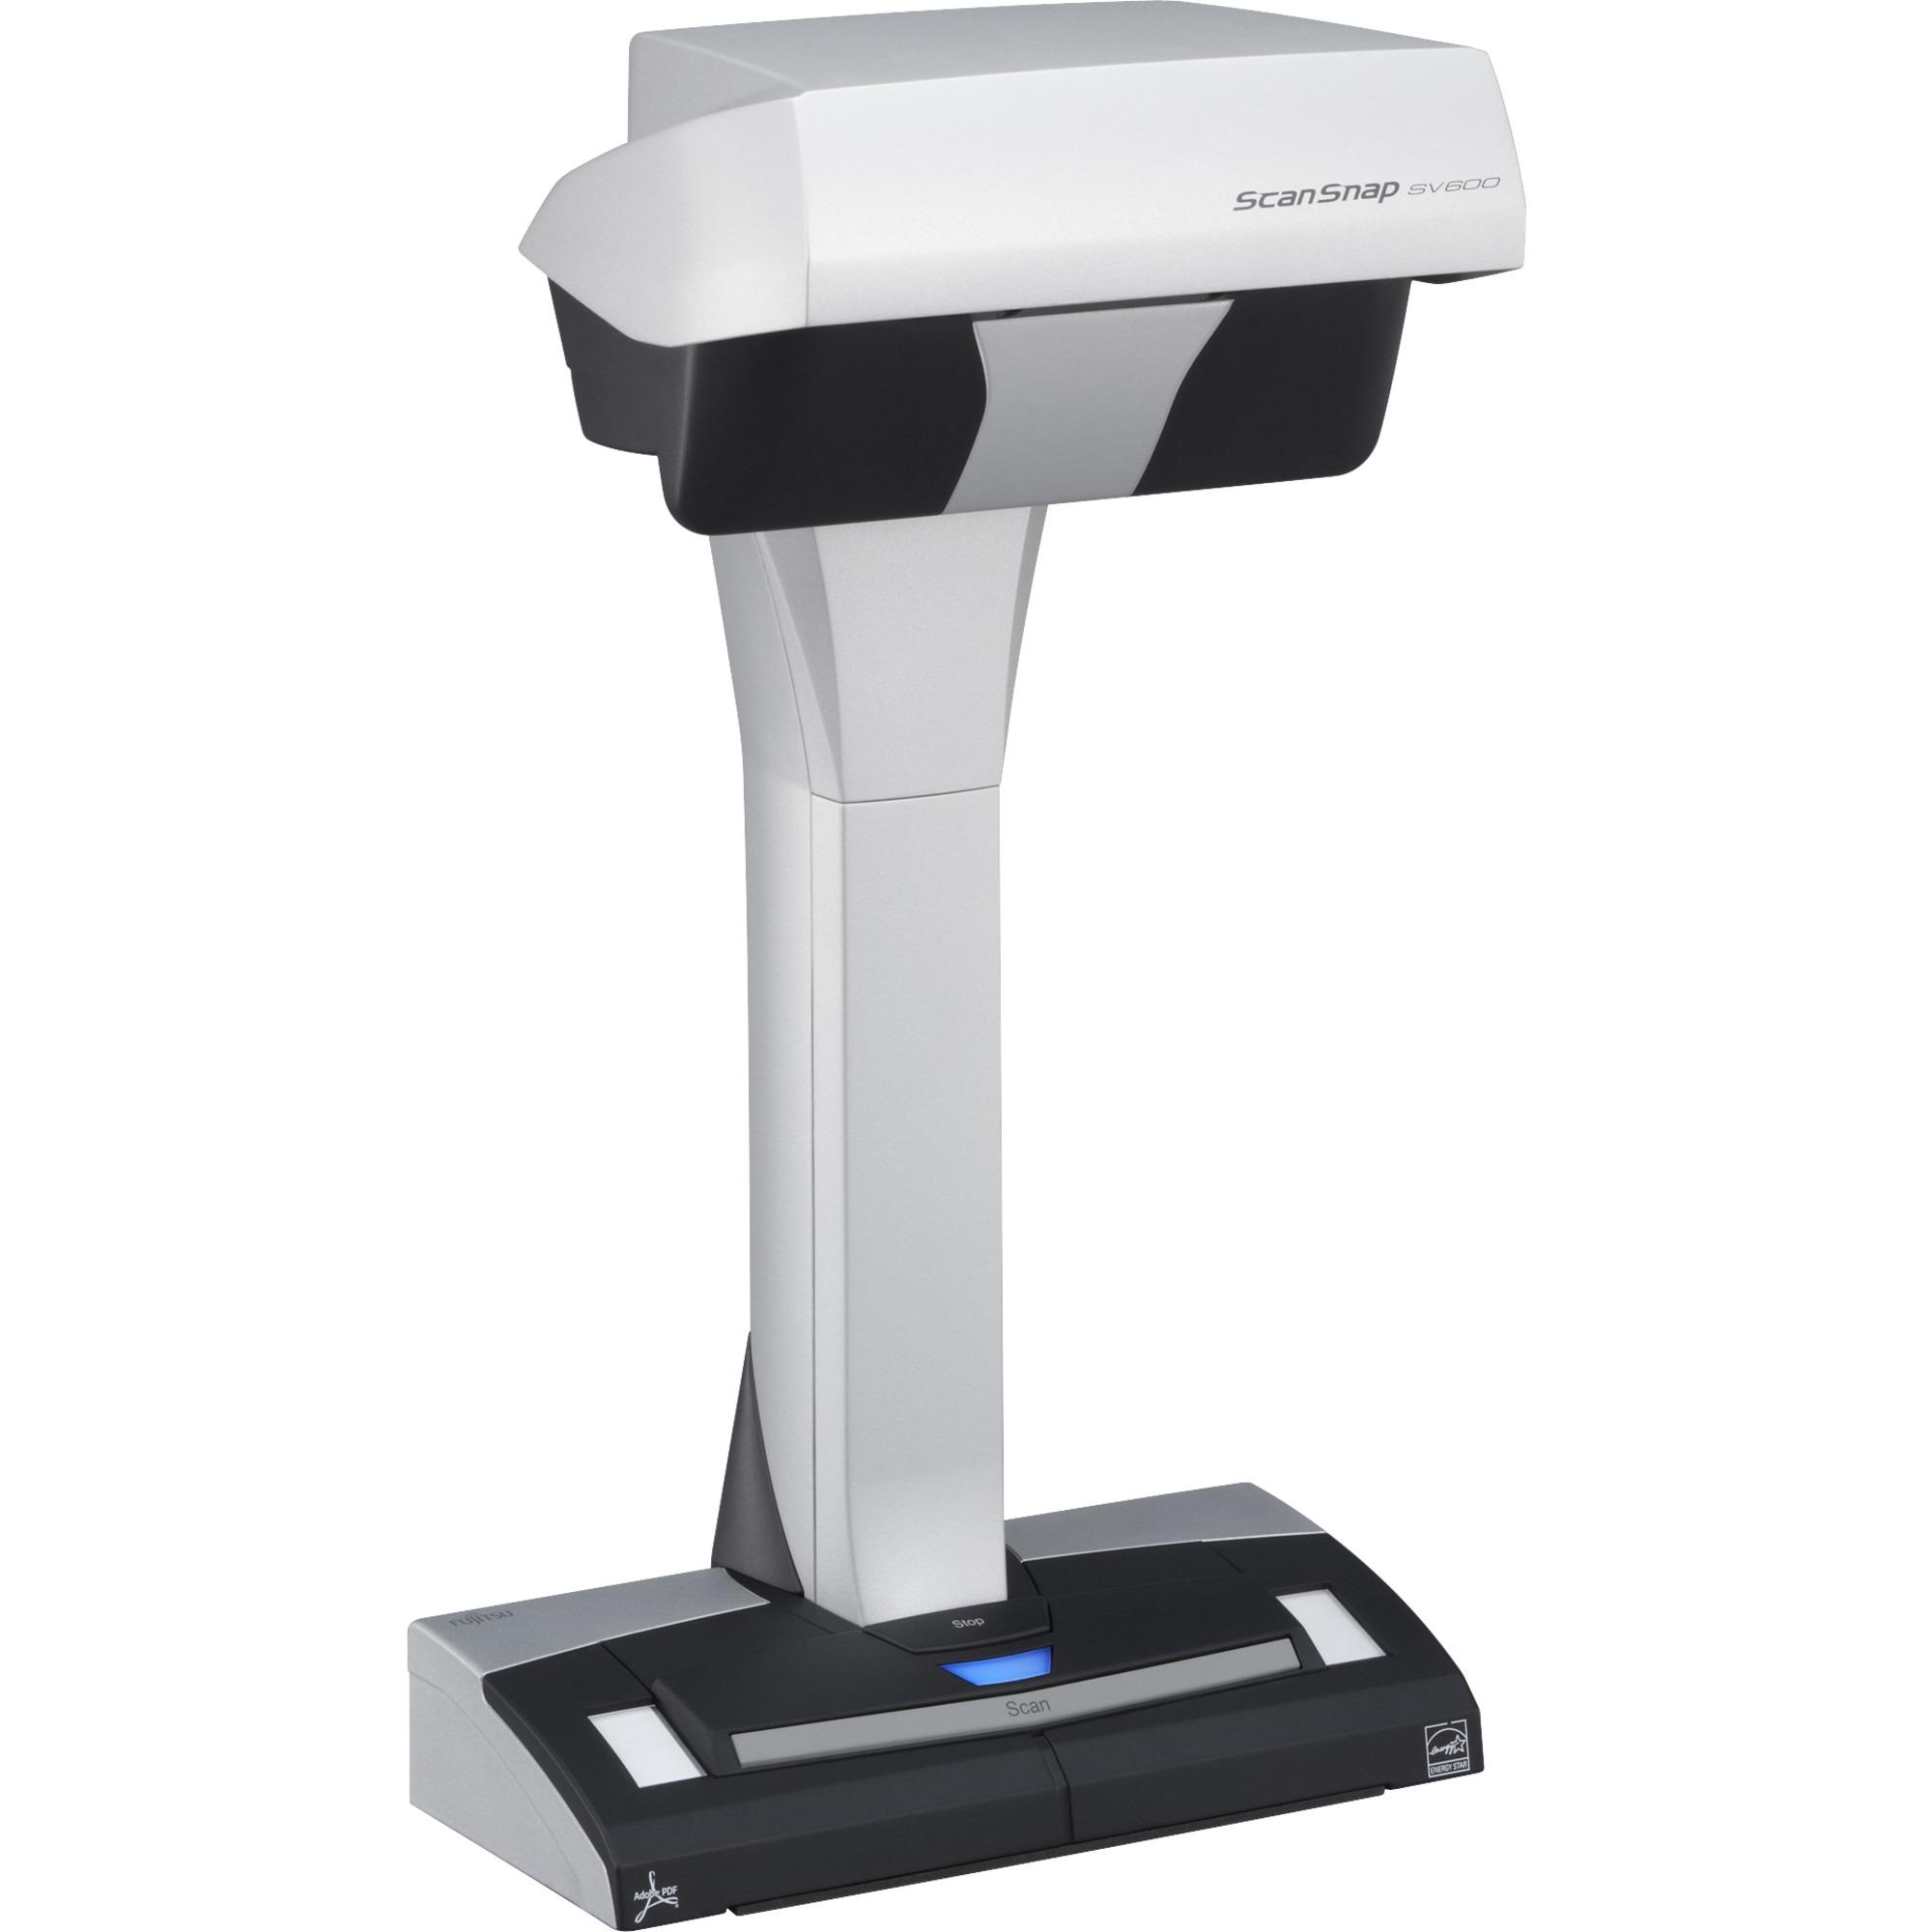 ScanSnap SV600 Overhead scanner 285 x 218DPI A3 Noir, Blanc